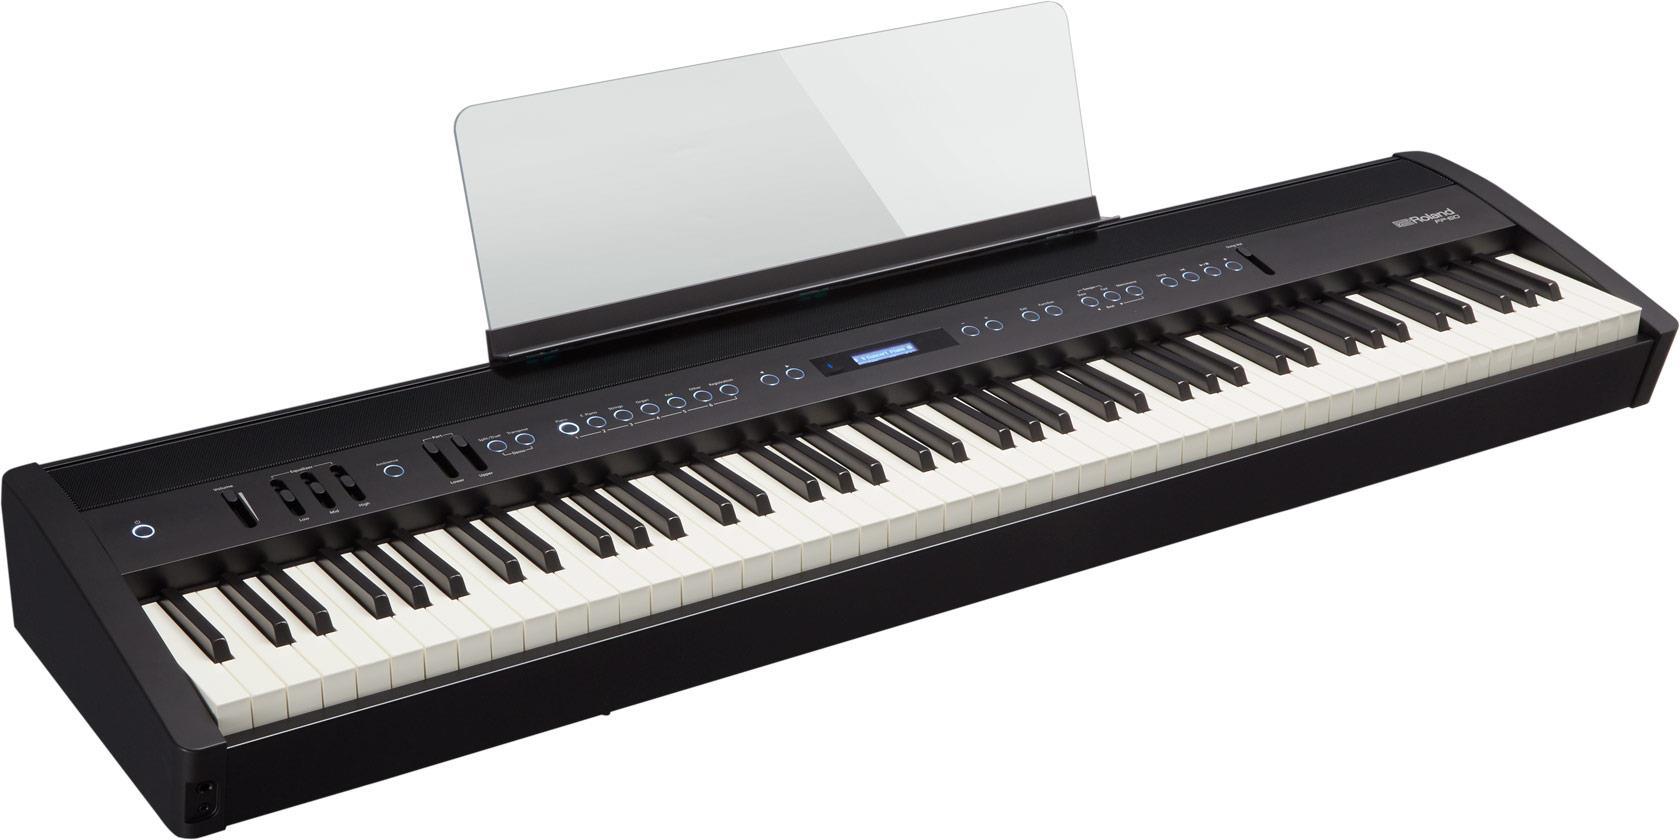 Digital Piano Free : roland fp 60 88 key digital piano end 9 4 2019 2 15 pm ~ Vivirlamusica.com Haus und Dekorationen